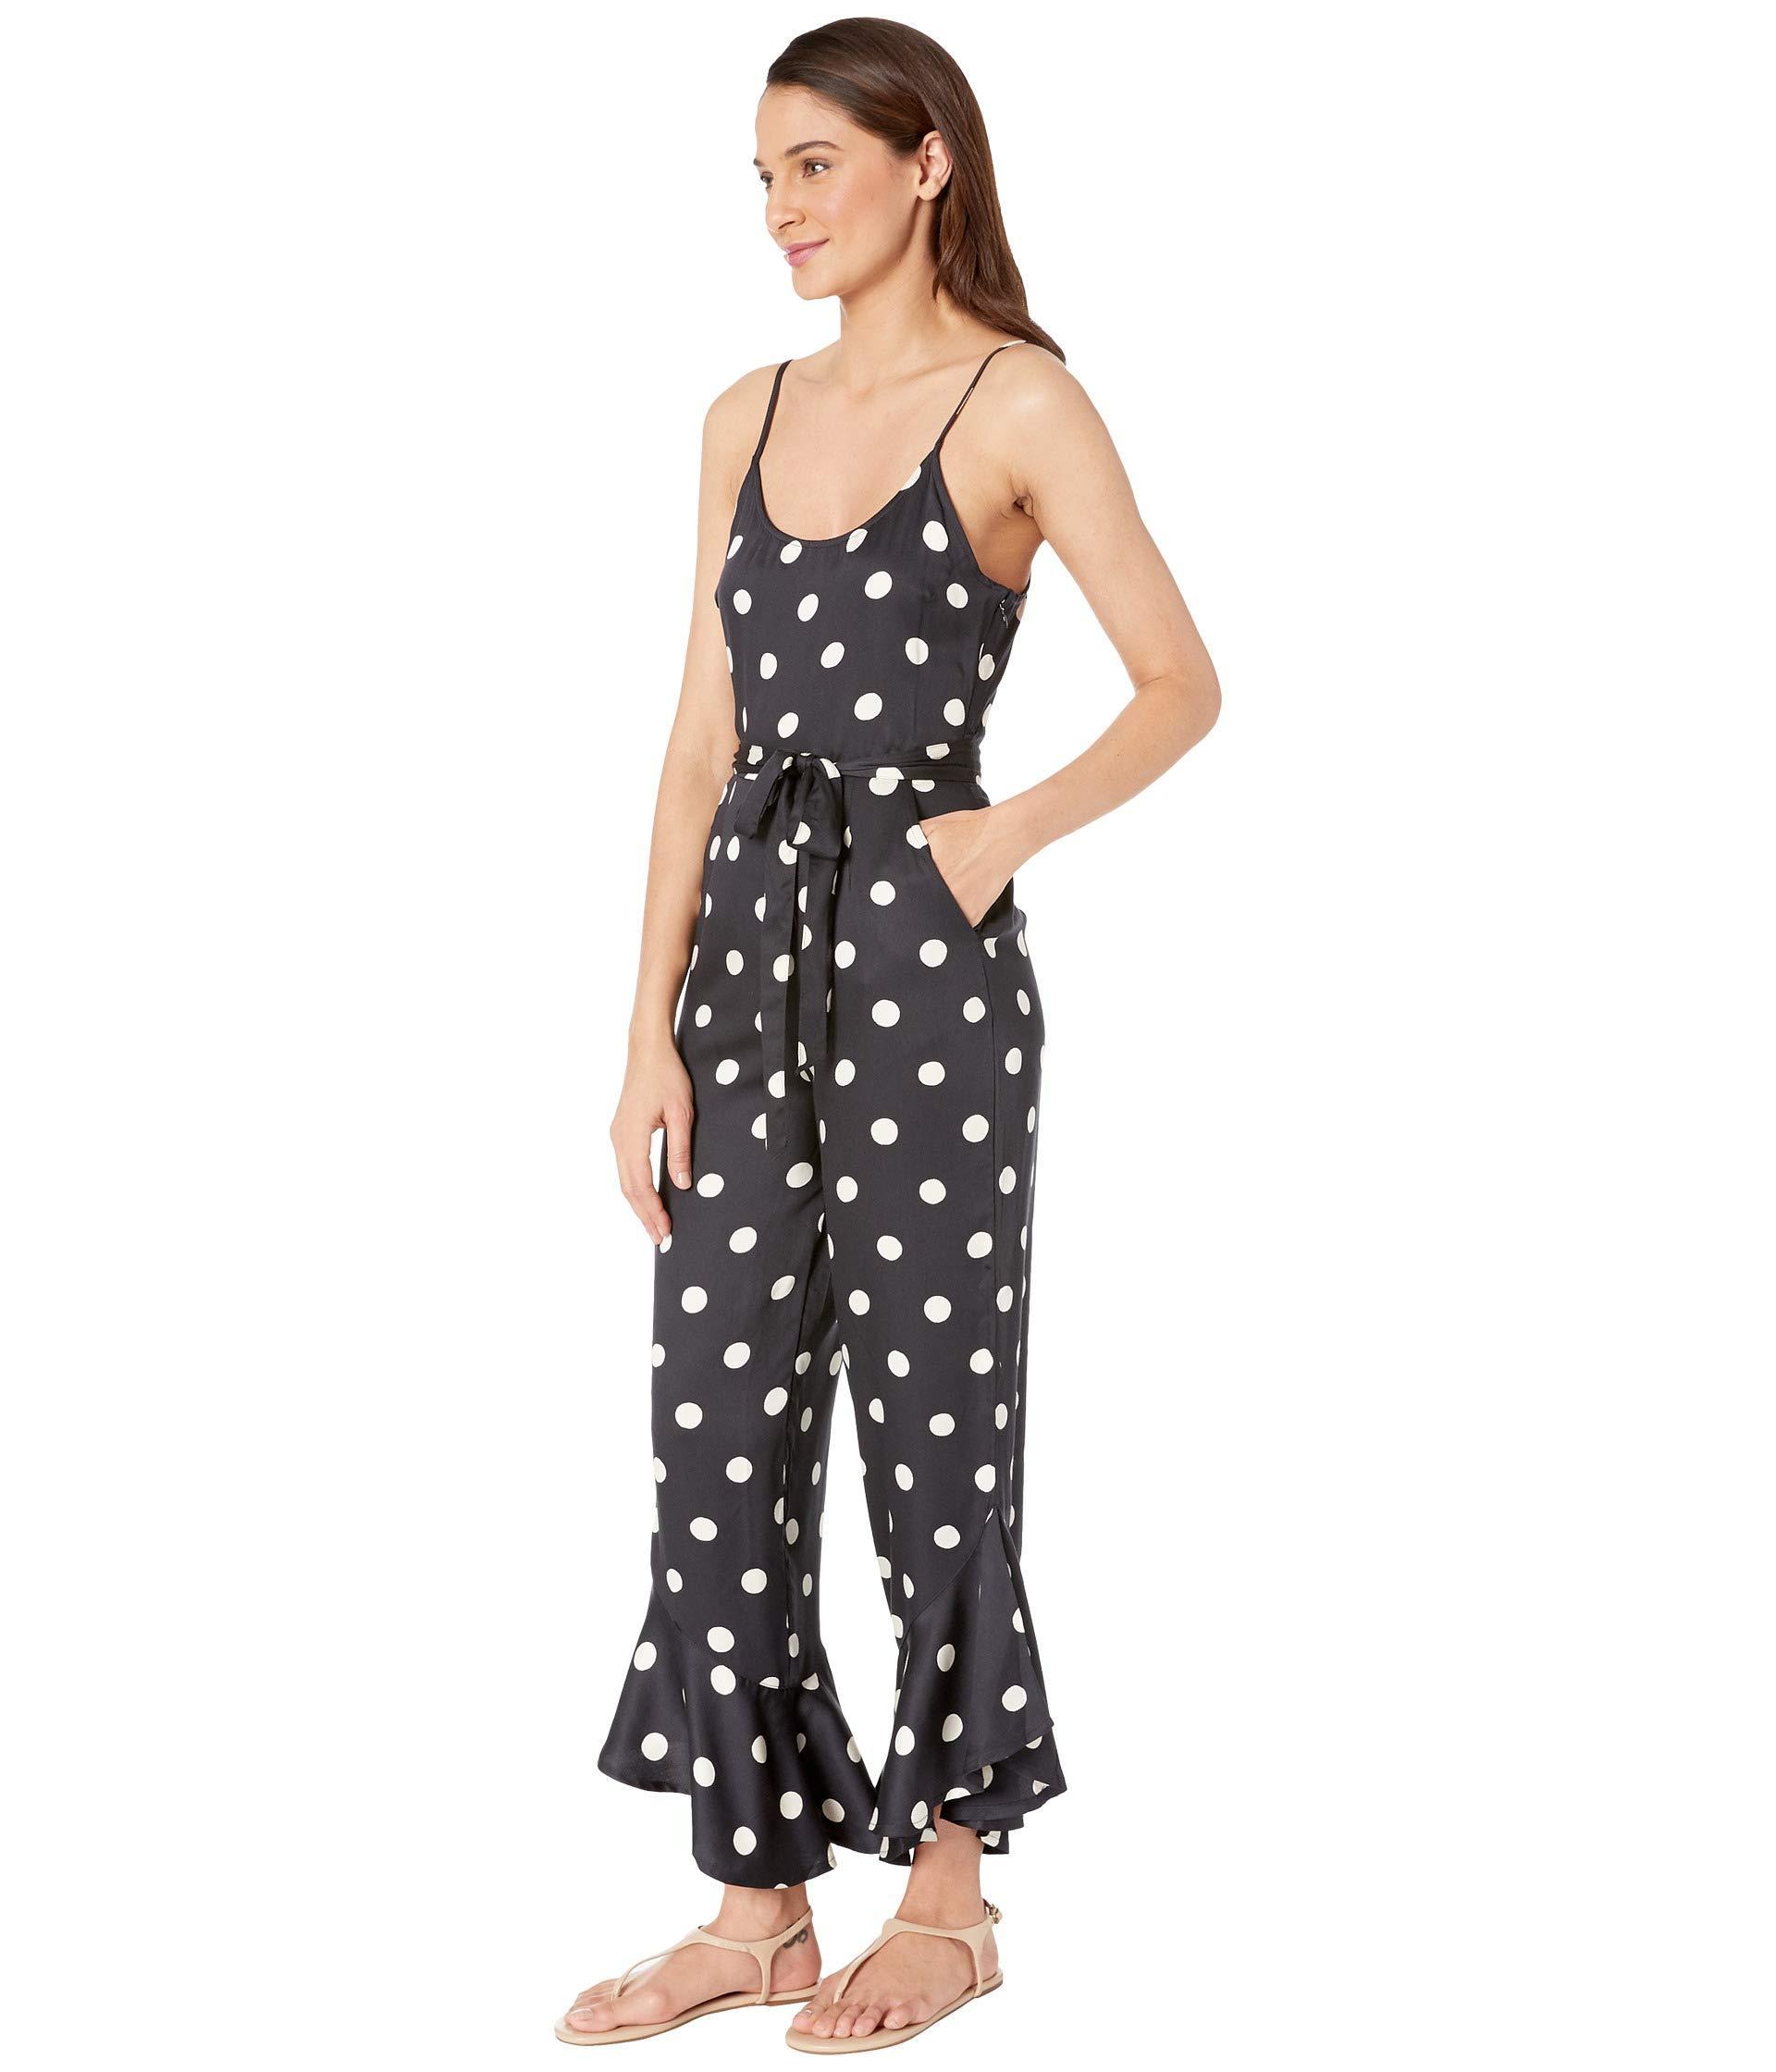 bbe9ce99123 Lyst - Billabong Jump In Polka Dot Jumpsuit in Black